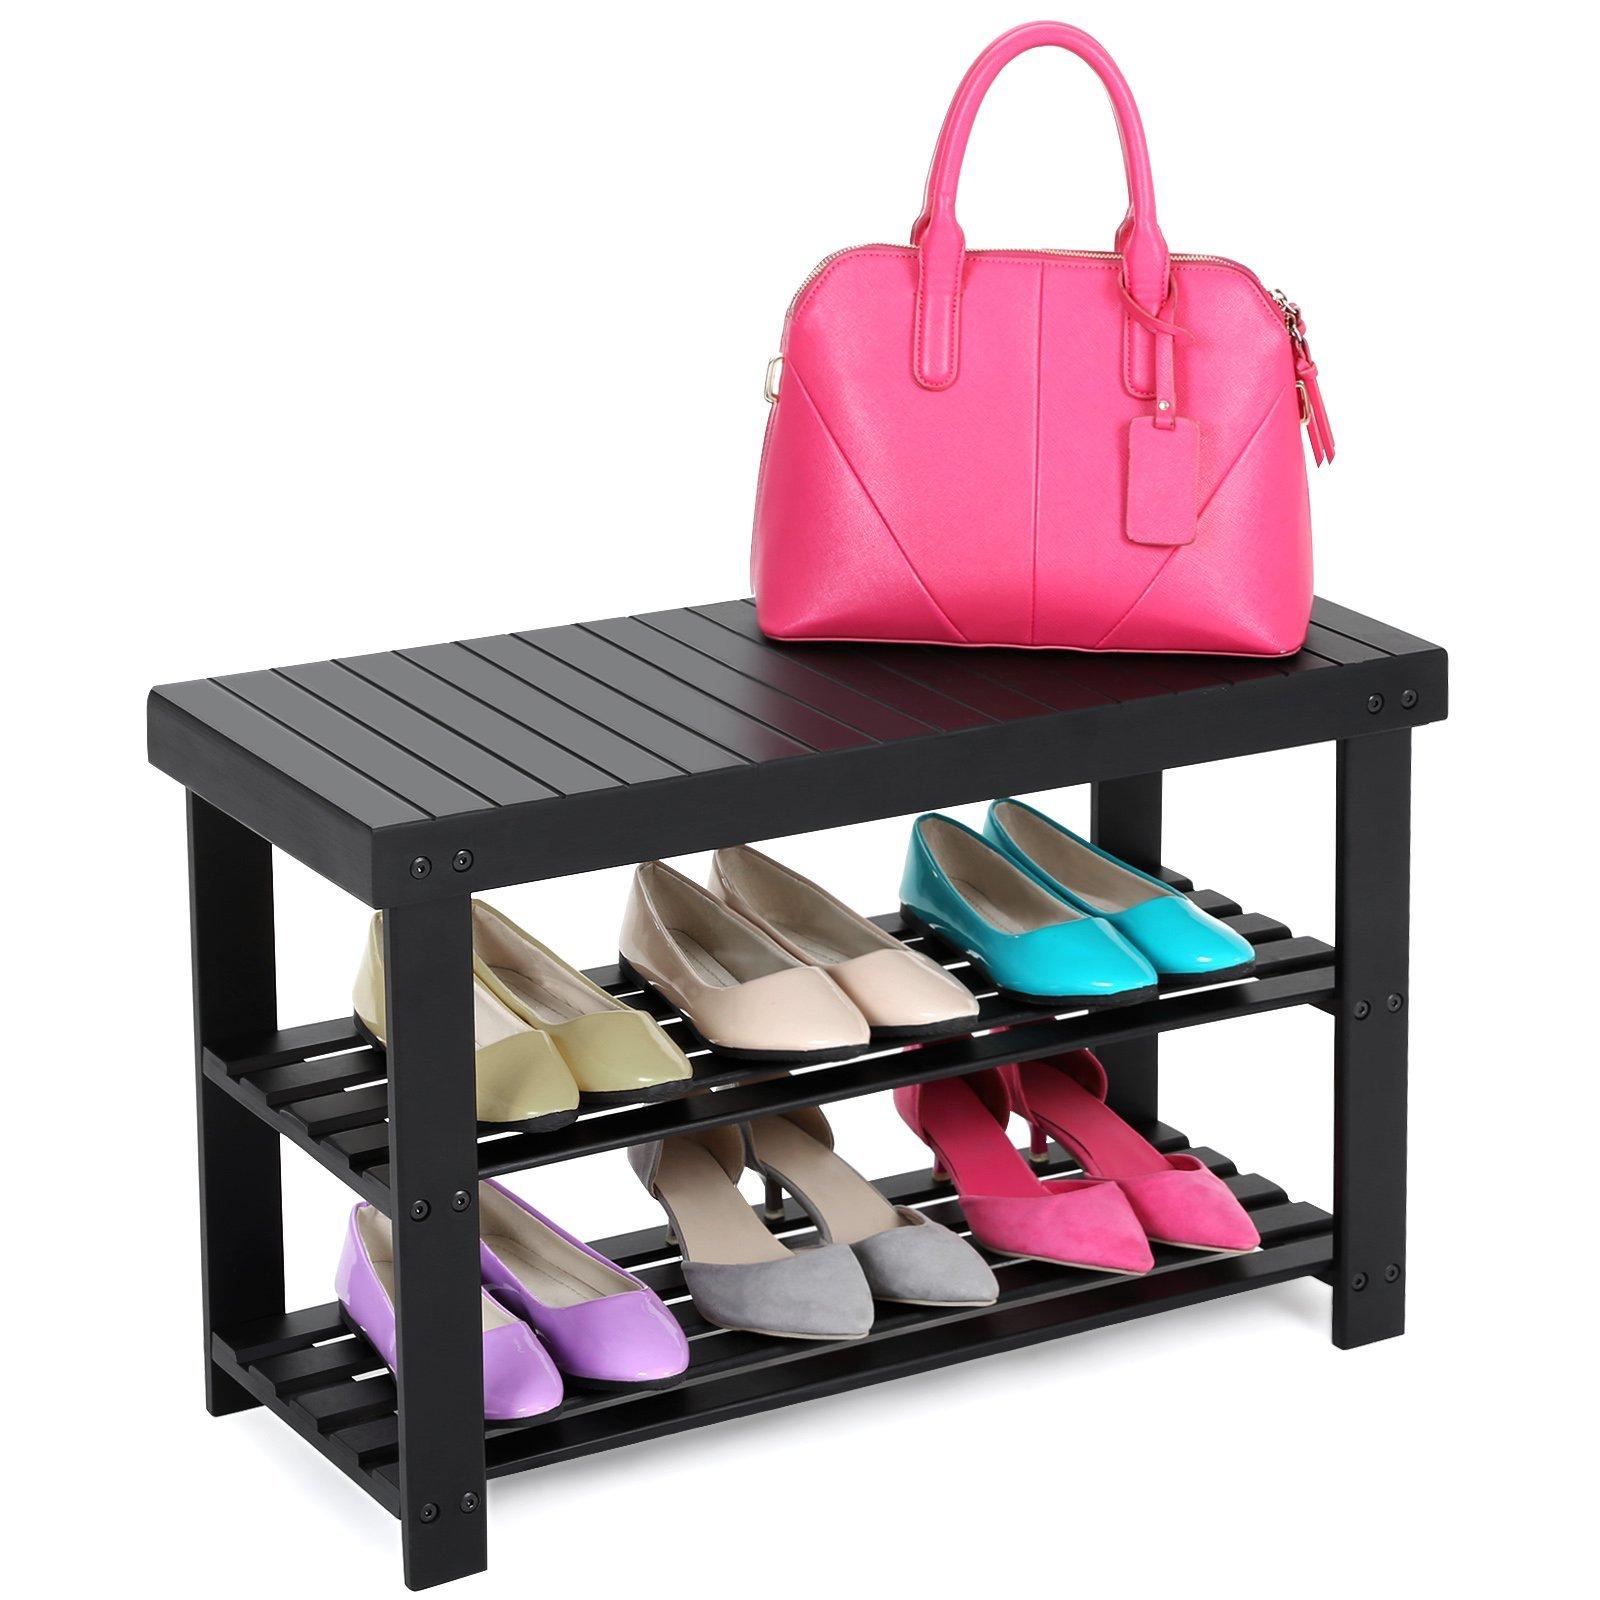 SONGMICS 3-Tier Shoe Bench Organizing Rack Entryway Storage Shelf 100% Bamboo